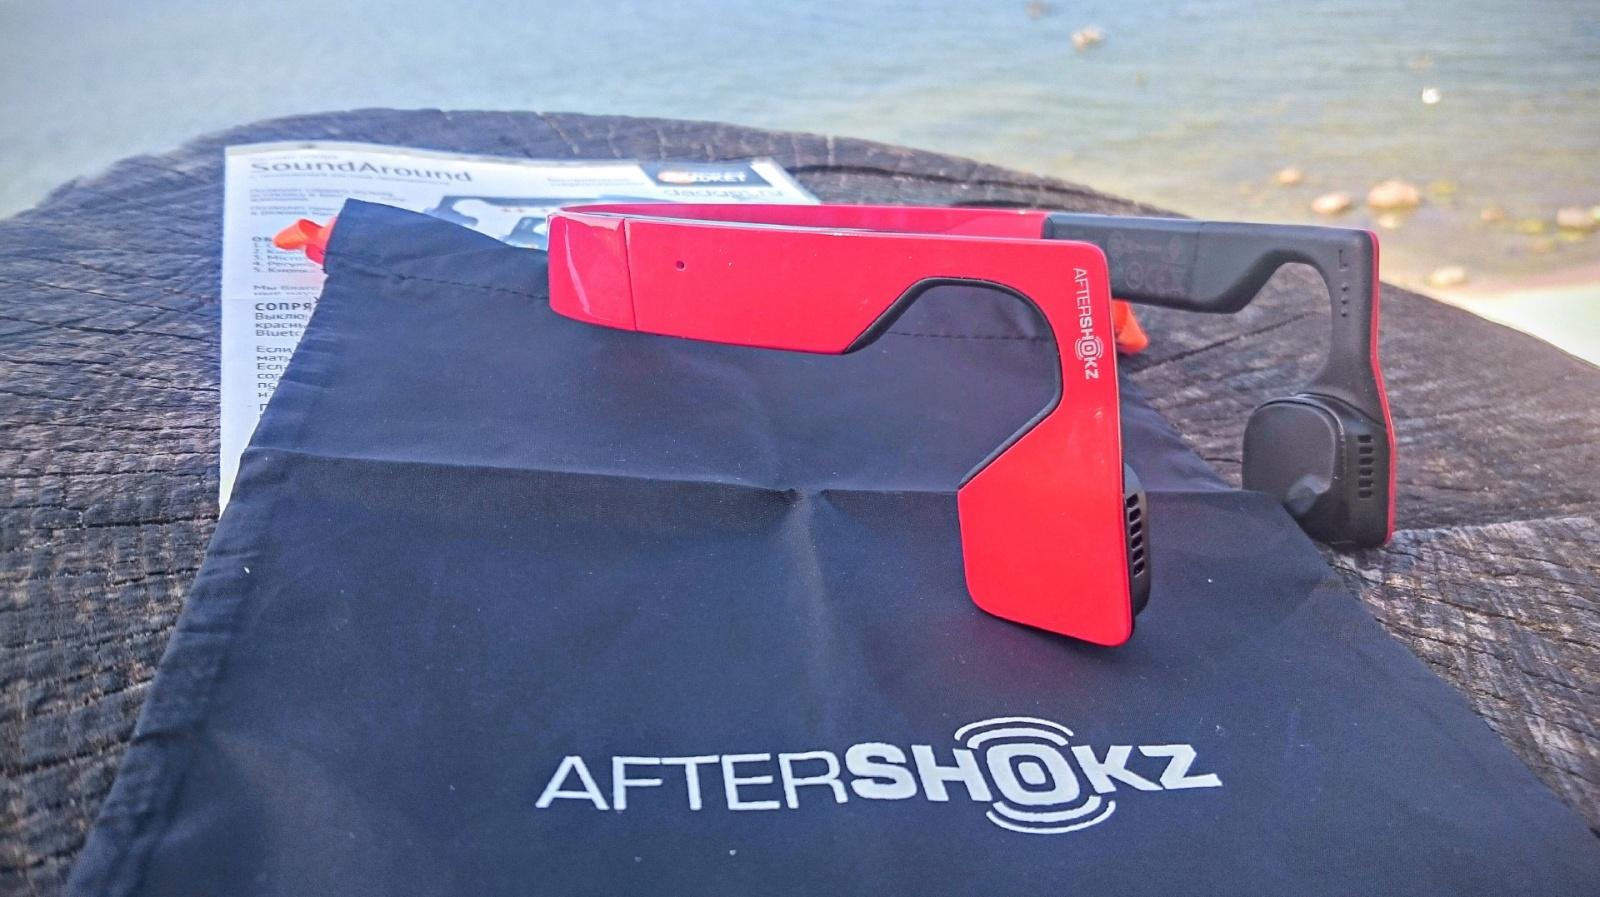 Внешний вид Aftershokz bluez 2